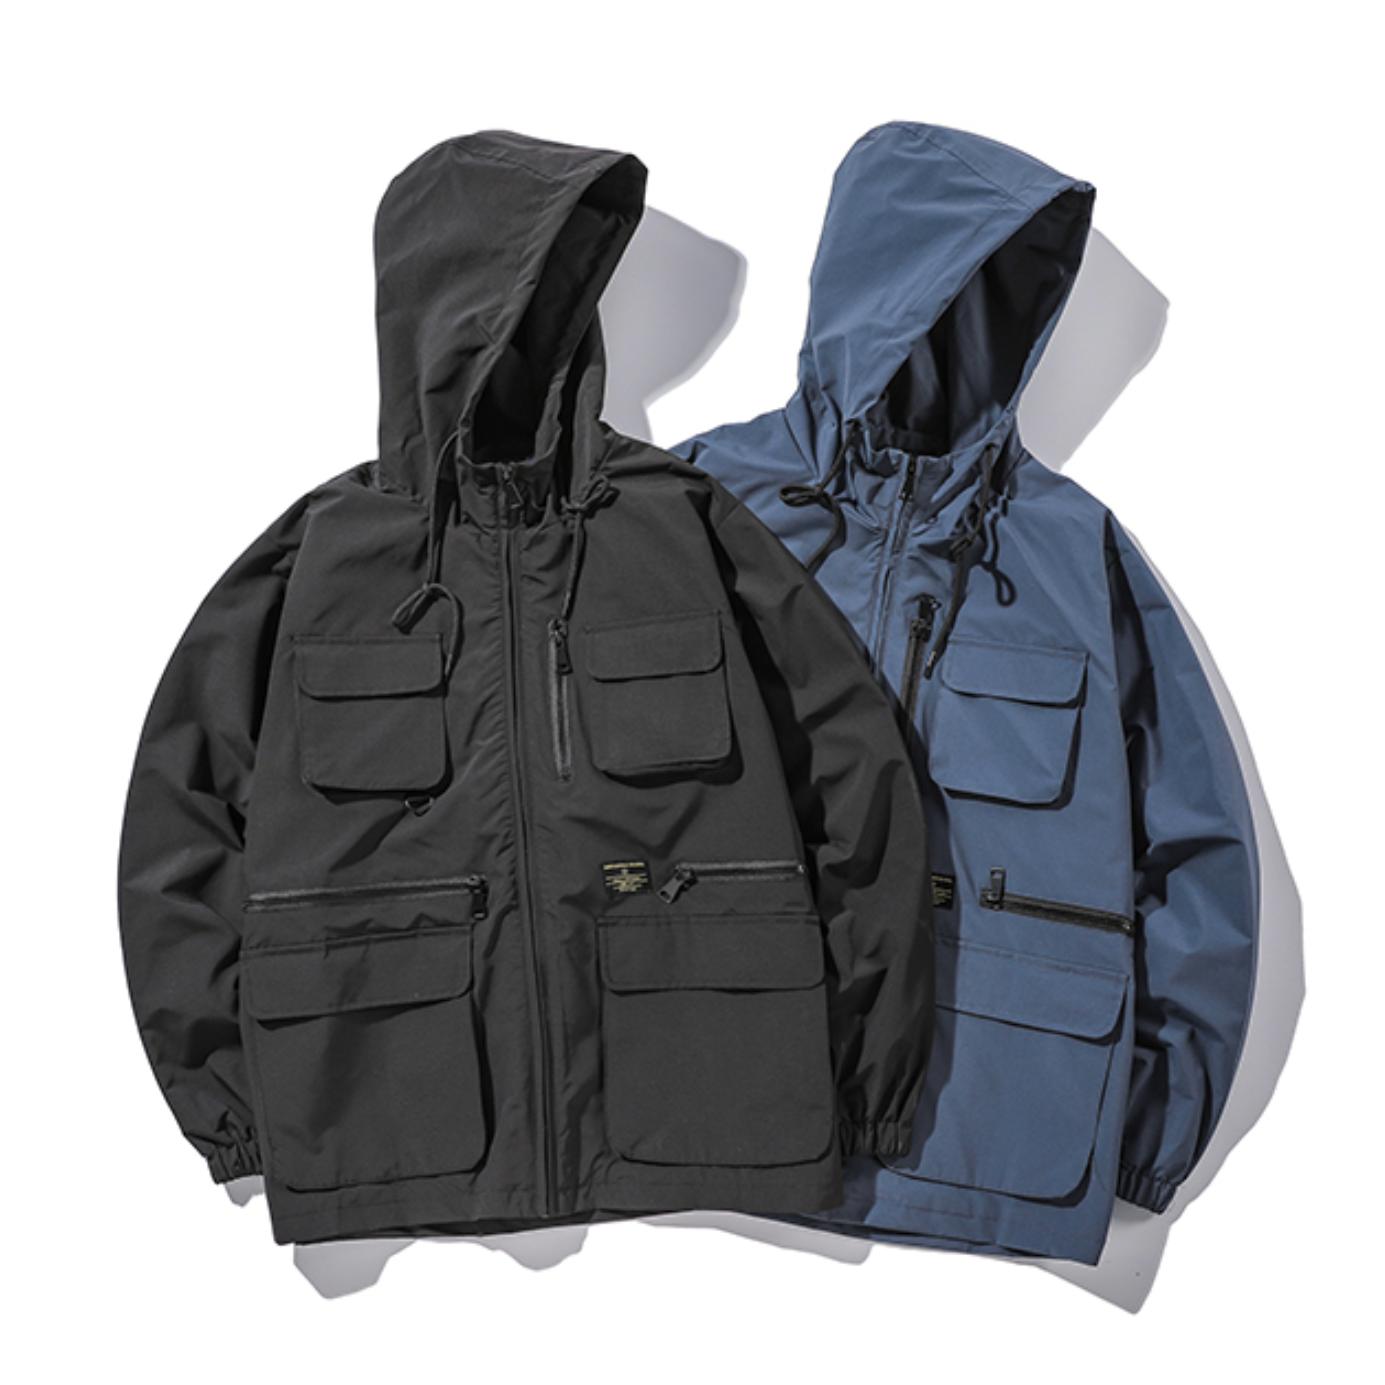 【UNISEX】ウィンドルース カップル マルチポケットフード ジャケット 【2colors】UN-532